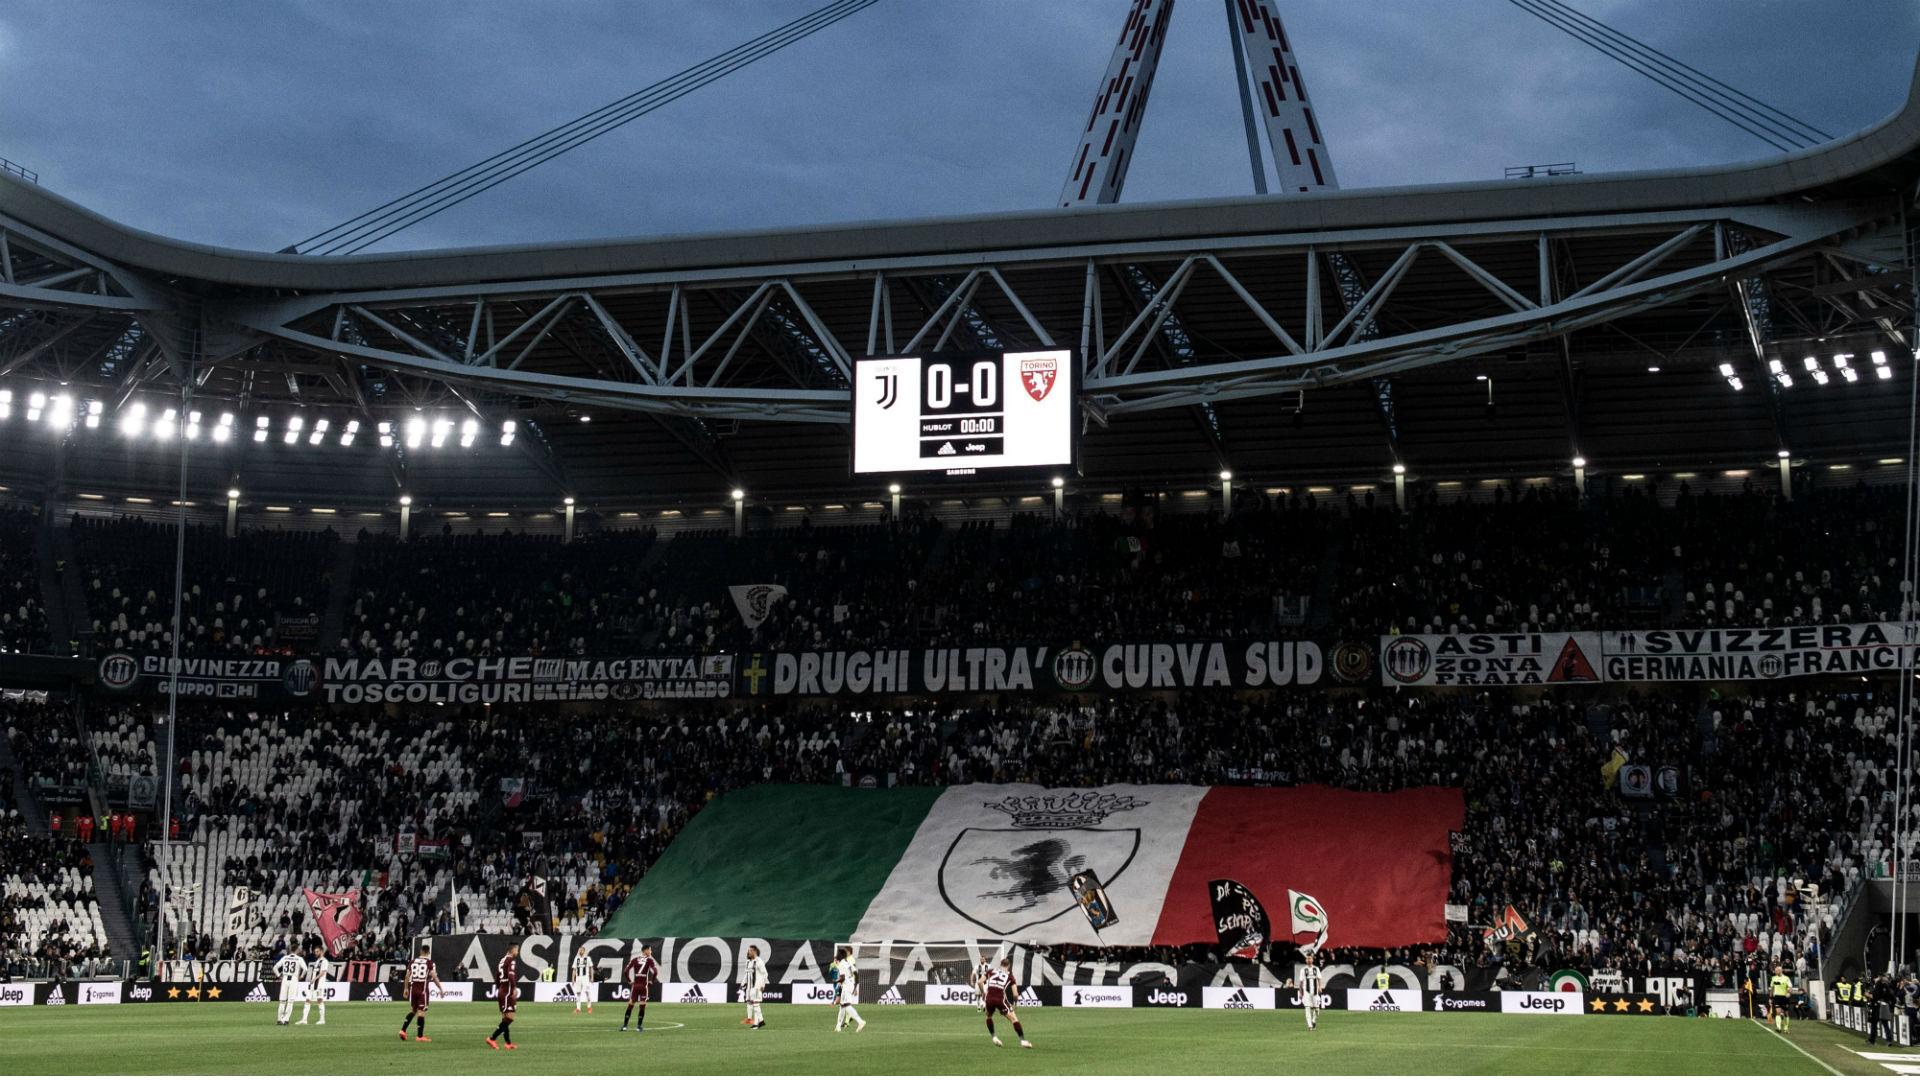 Mima aereo Superga: la Juventus bandisce tifoso dallo stadio per 5 anni